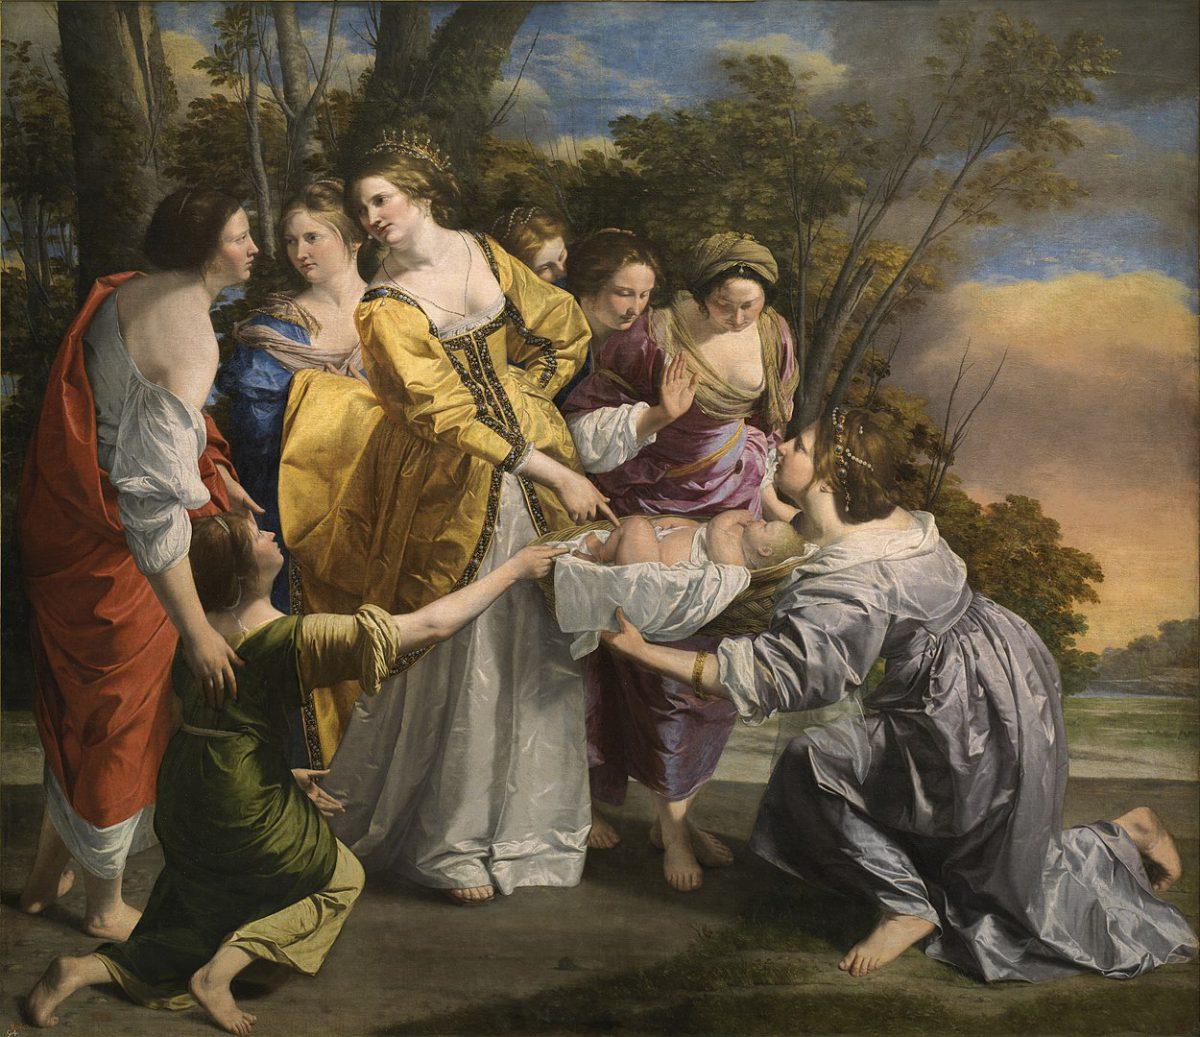 Finding Moses, Orazio Gentileschi, 1633